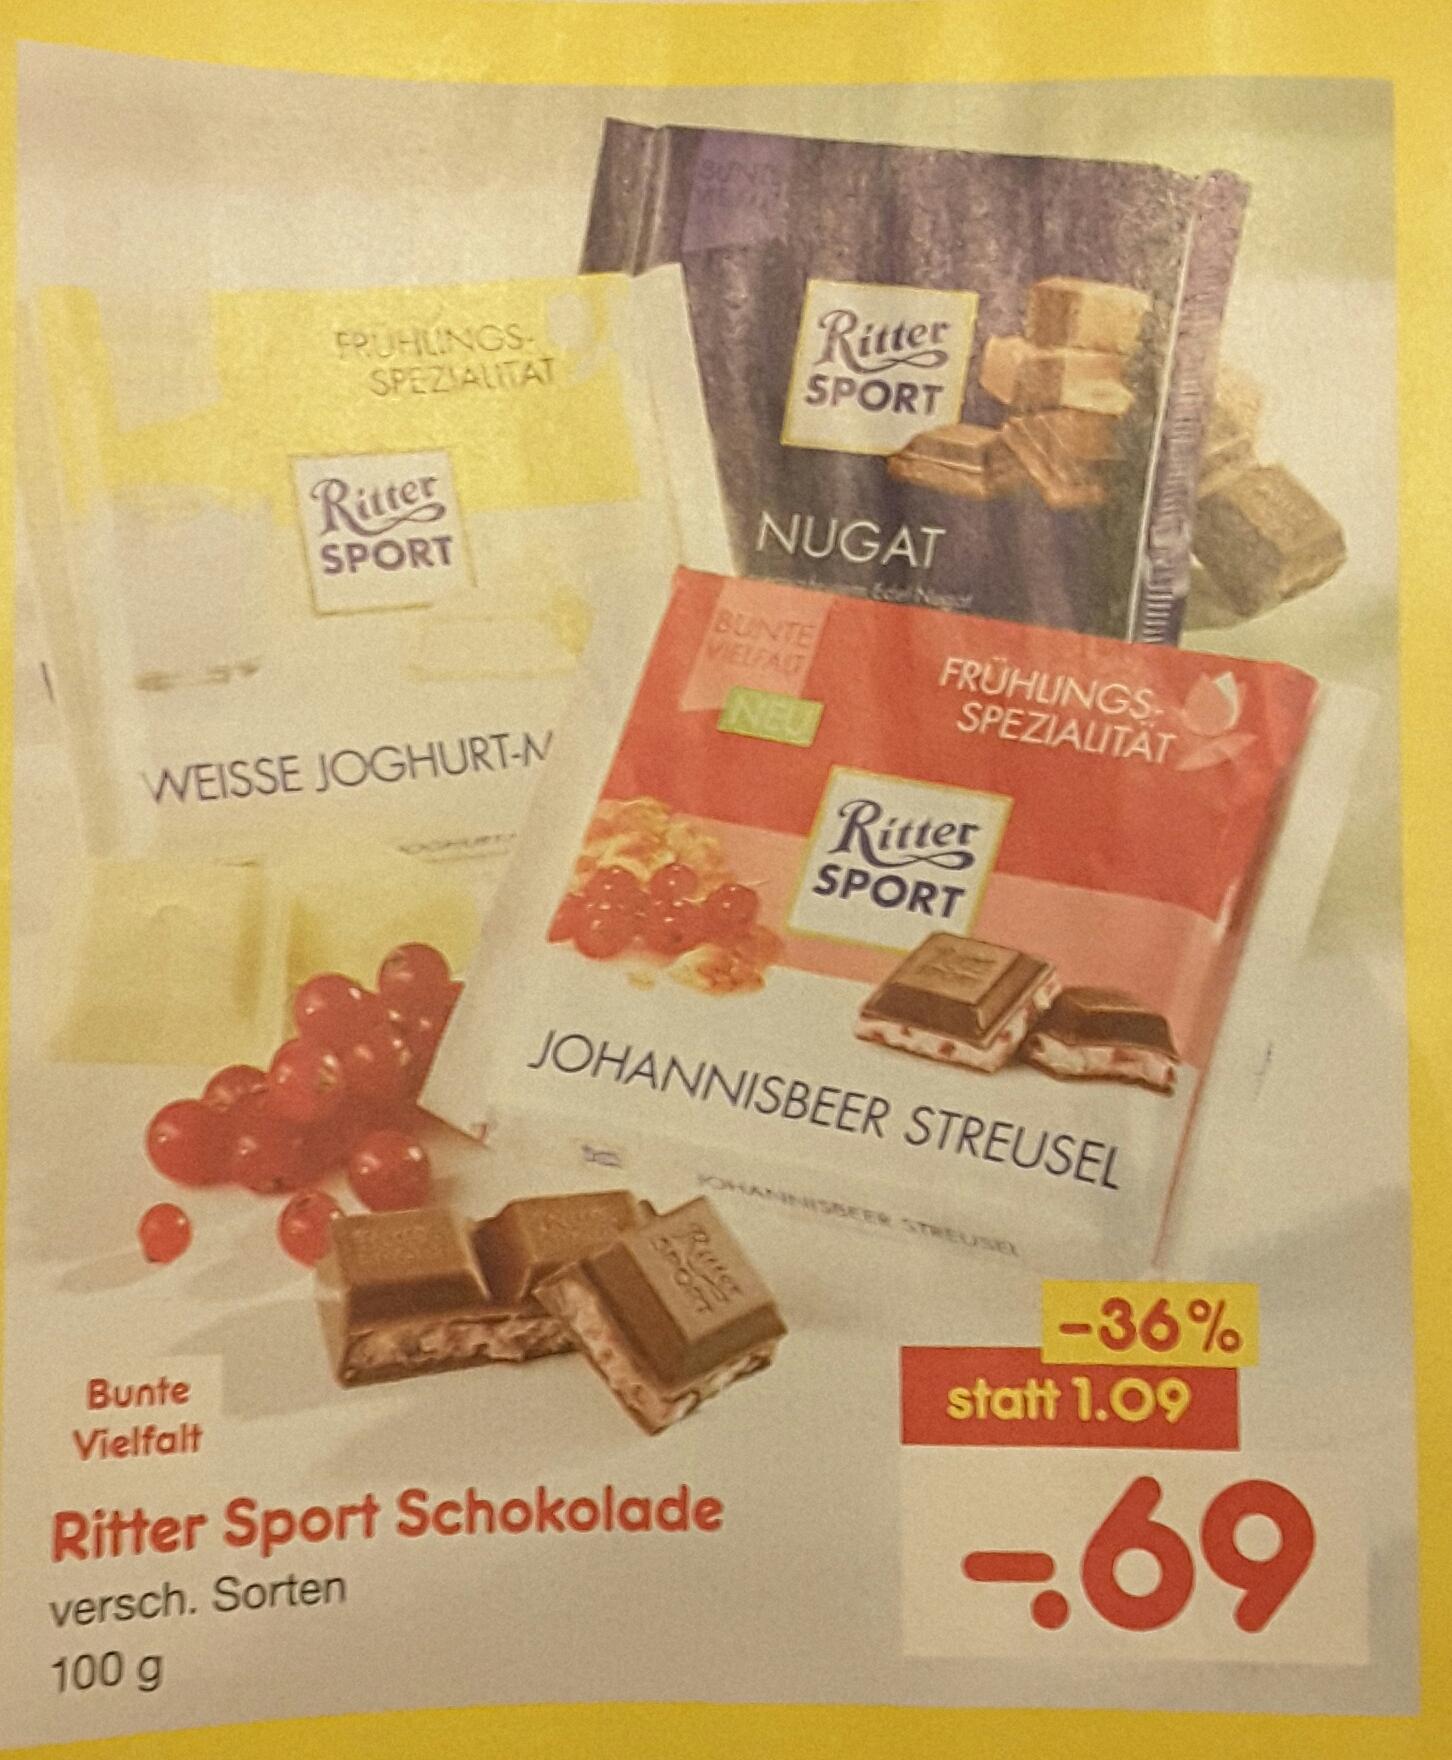 Ritter Sport verschiedene Sorten bei Netto